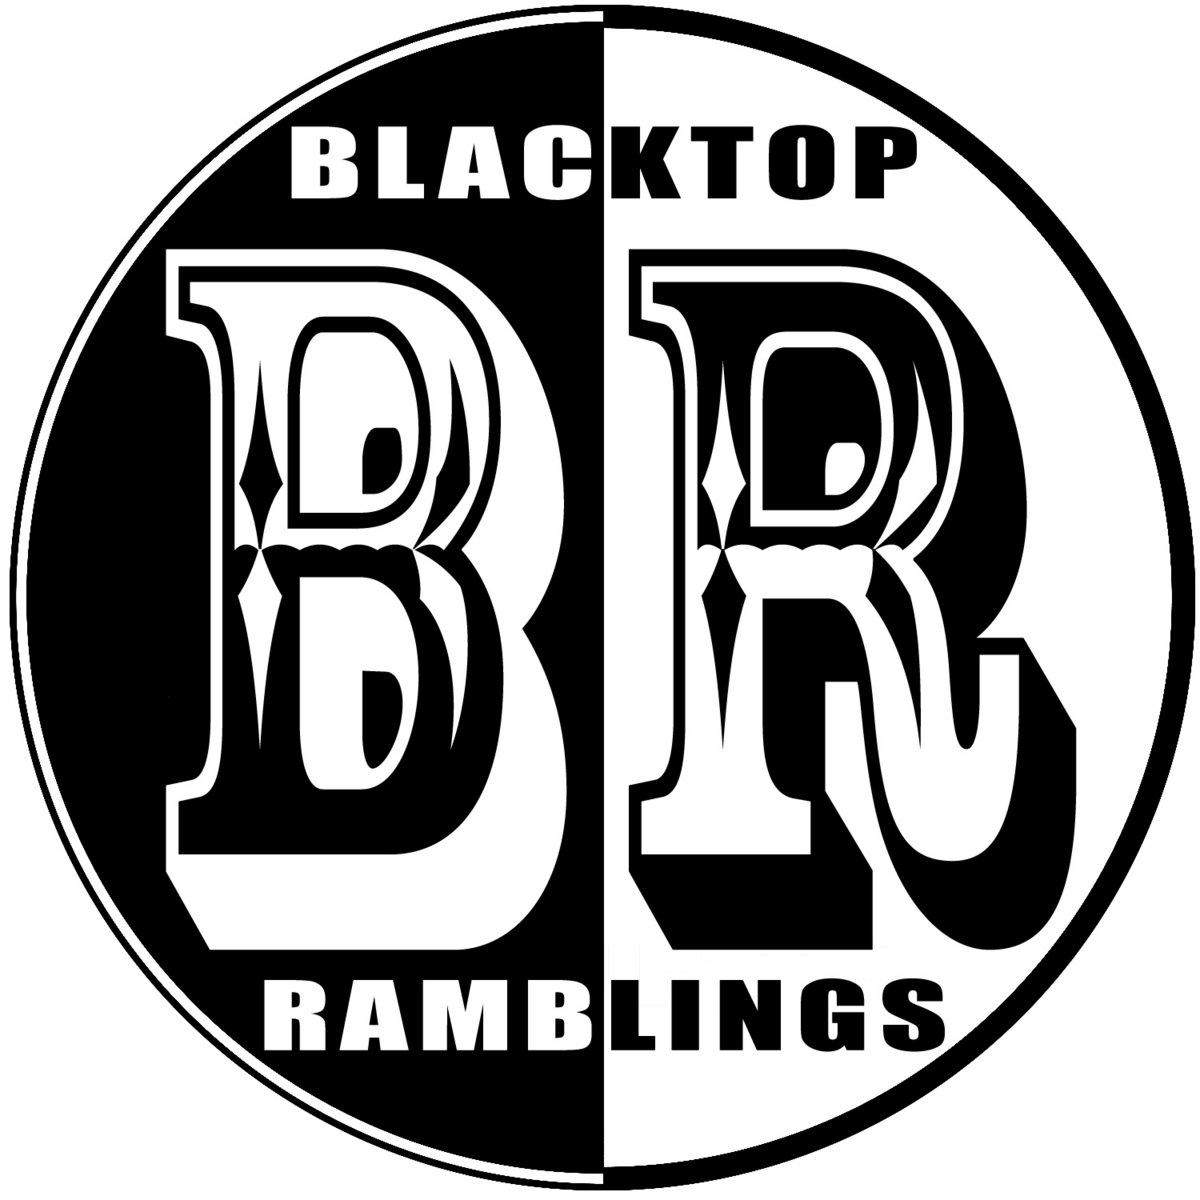 Blacktop Ramblings Podcast | Acousta Noir